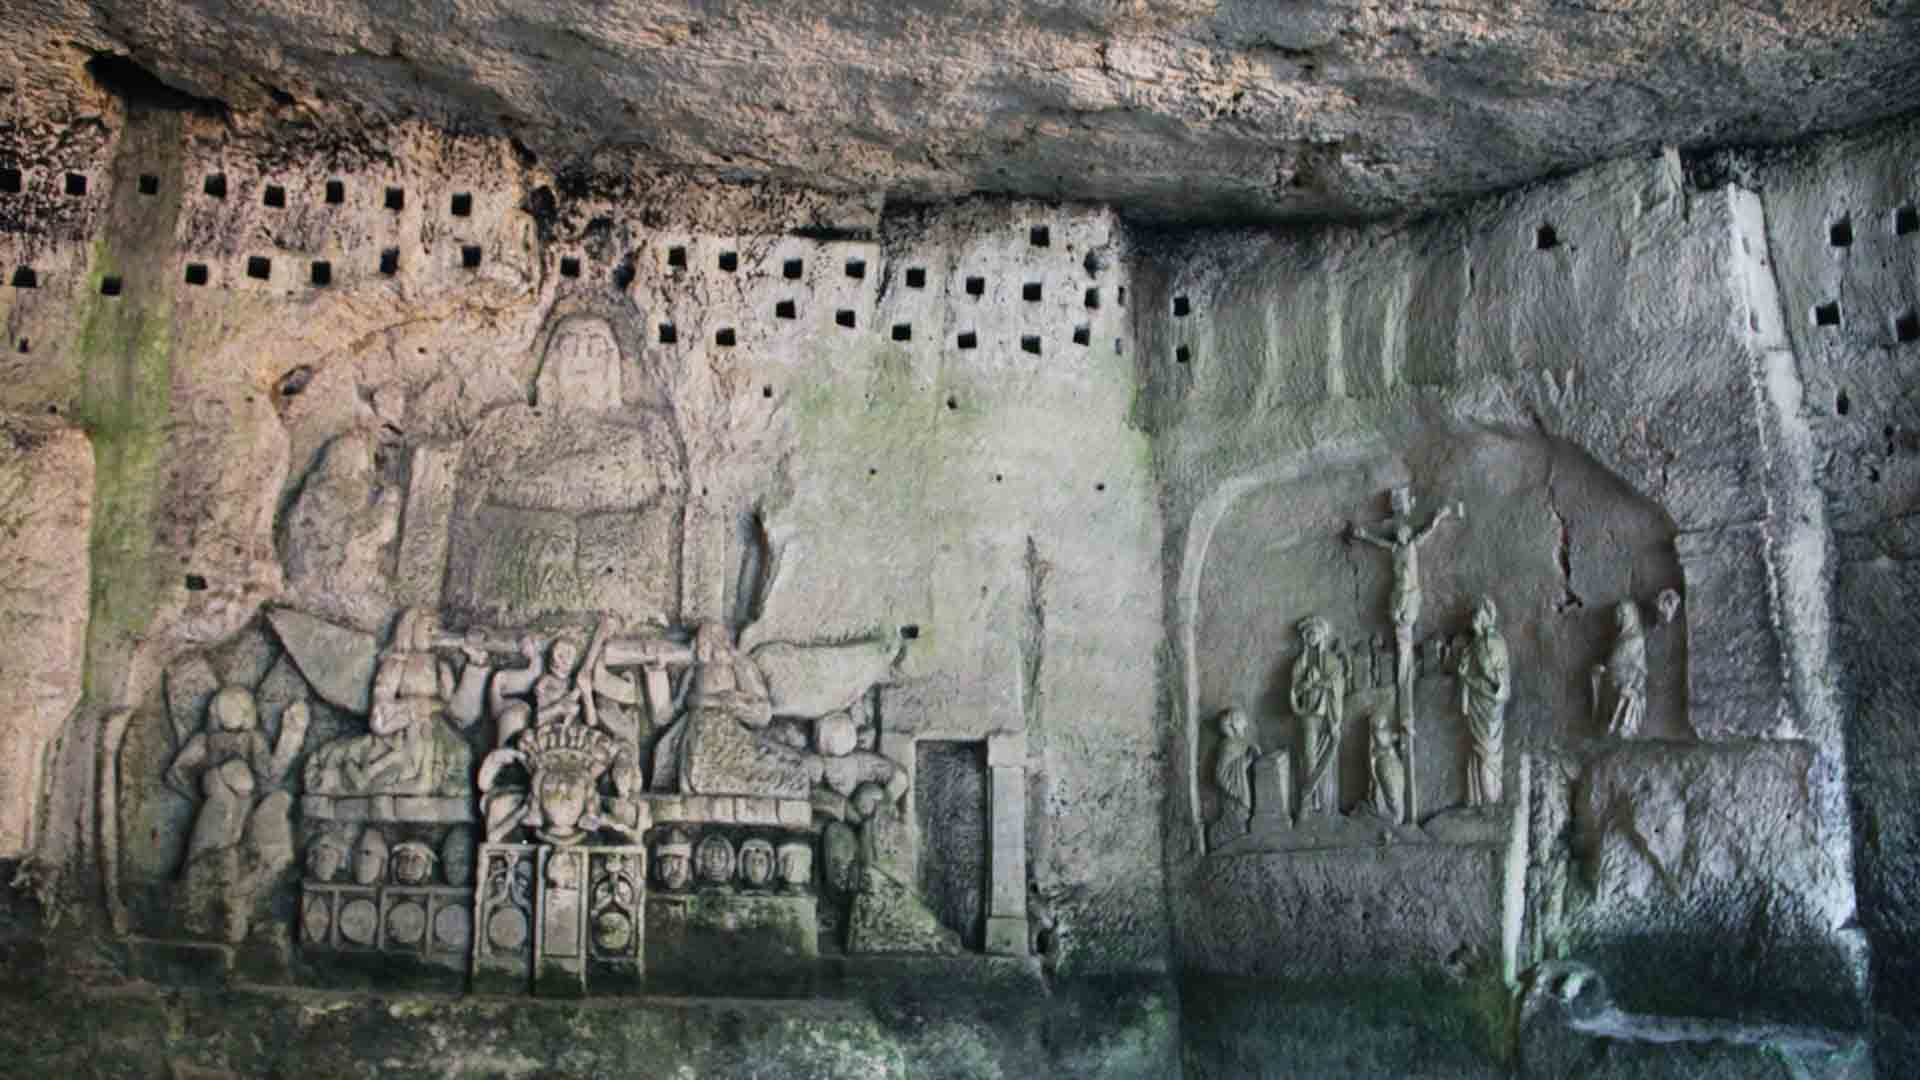 brantom-sud-ouest-dordogne-grottes